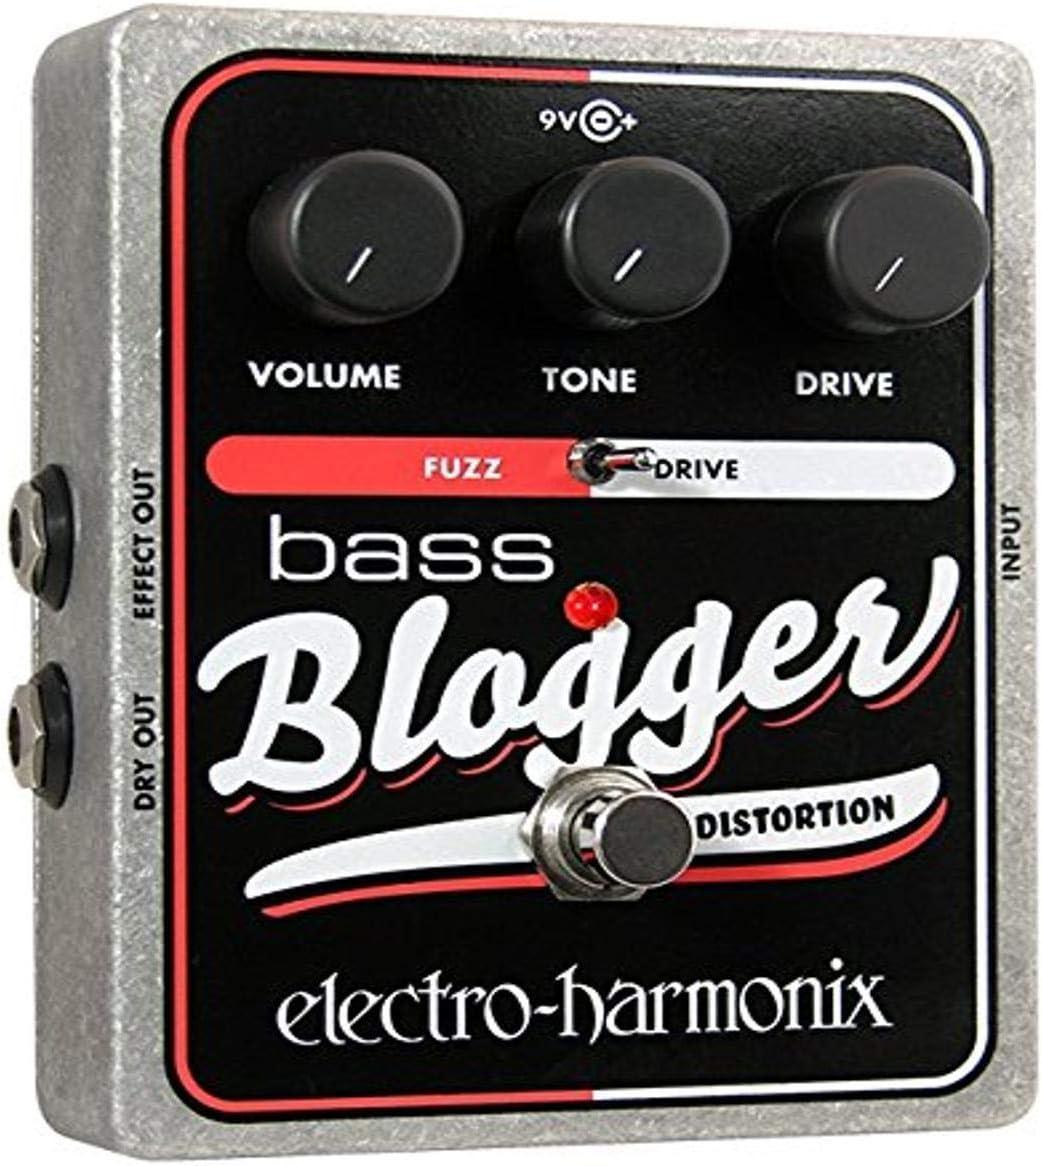 Electro-Harmonix Bass Blogger Distortion/Overdrive Pedal